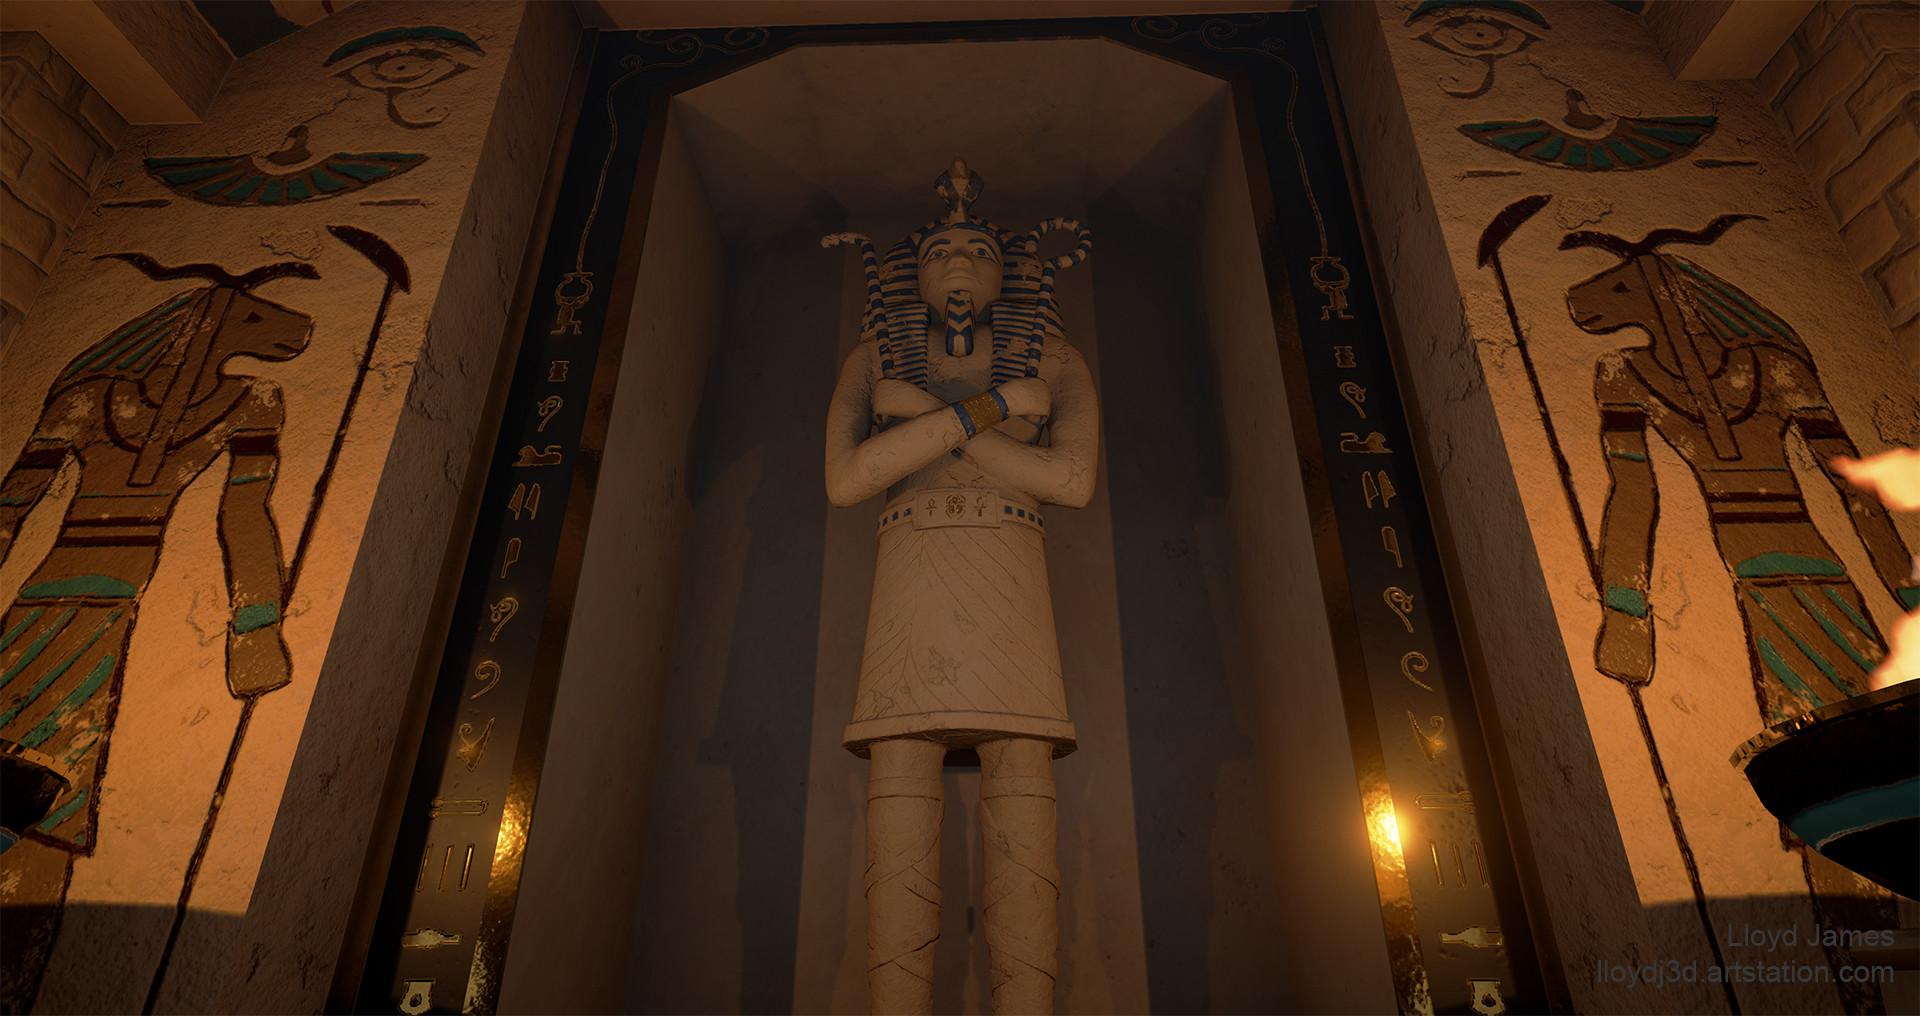 Lloyd james final shrine 131116